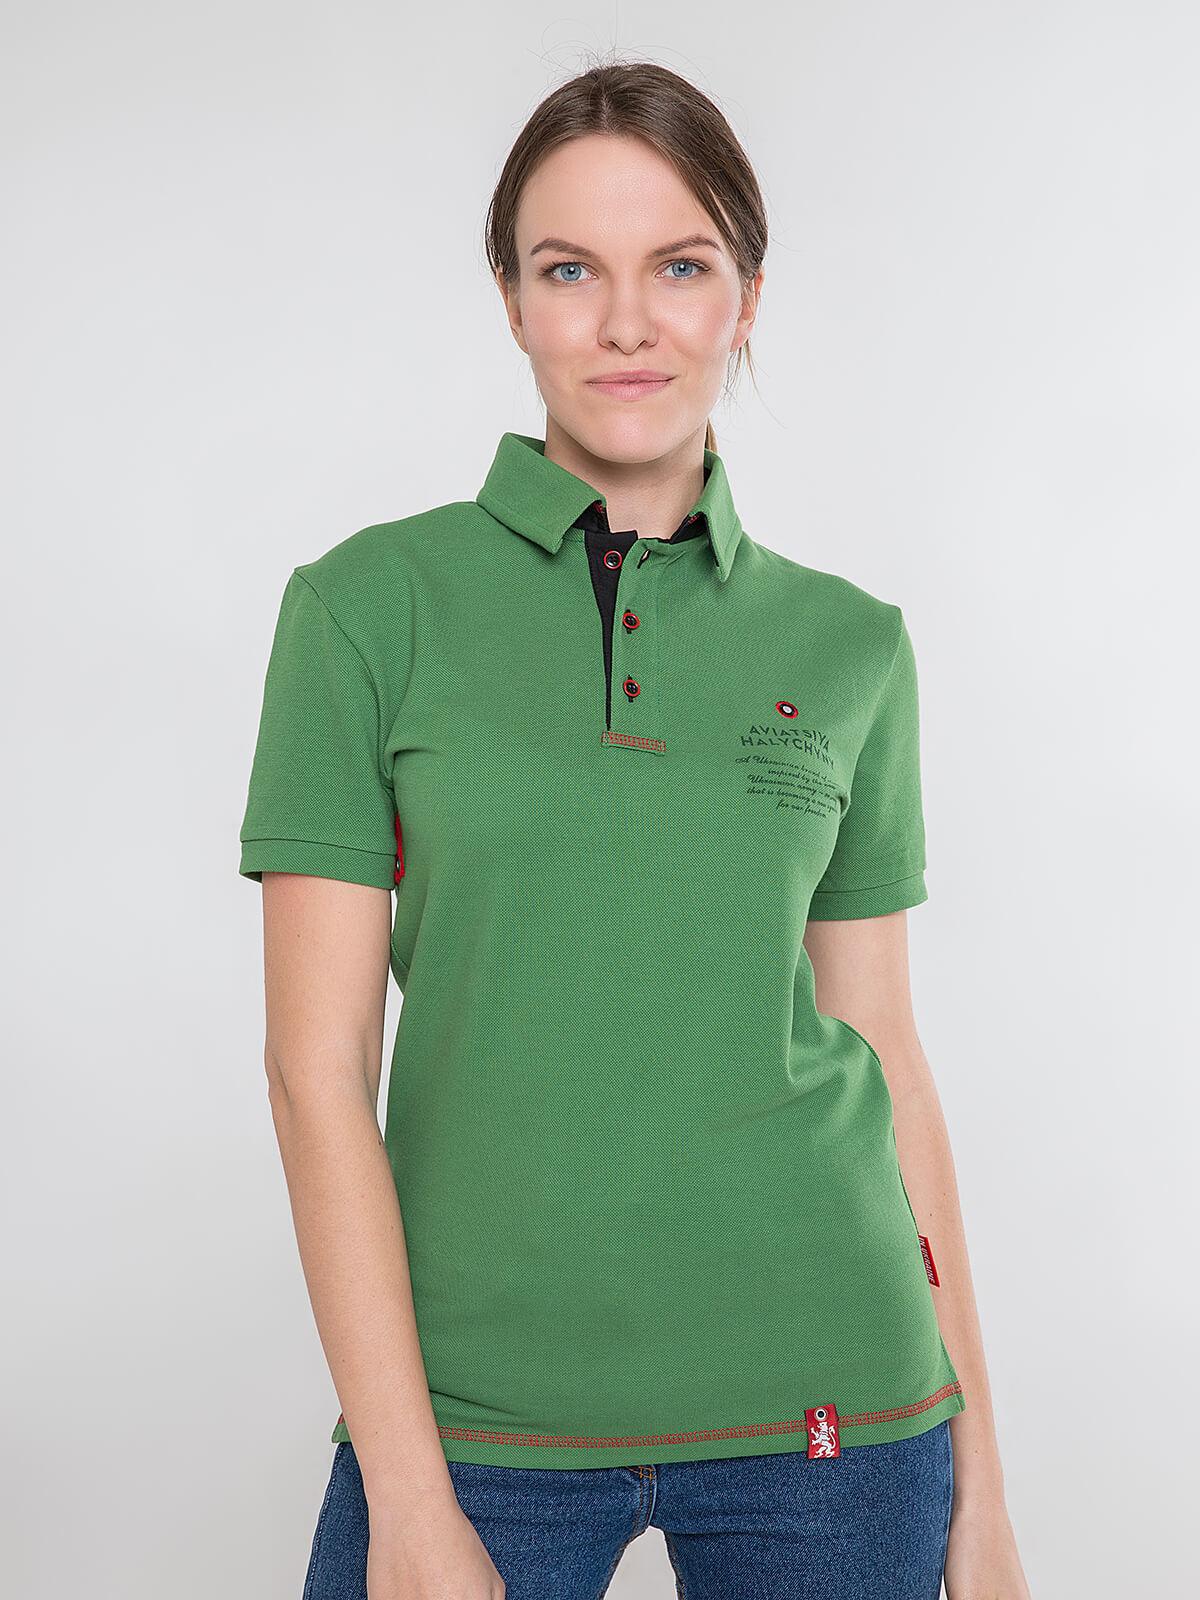 Women's Polo Shirt Wings. Color green. Unisex polo (men's sizes).